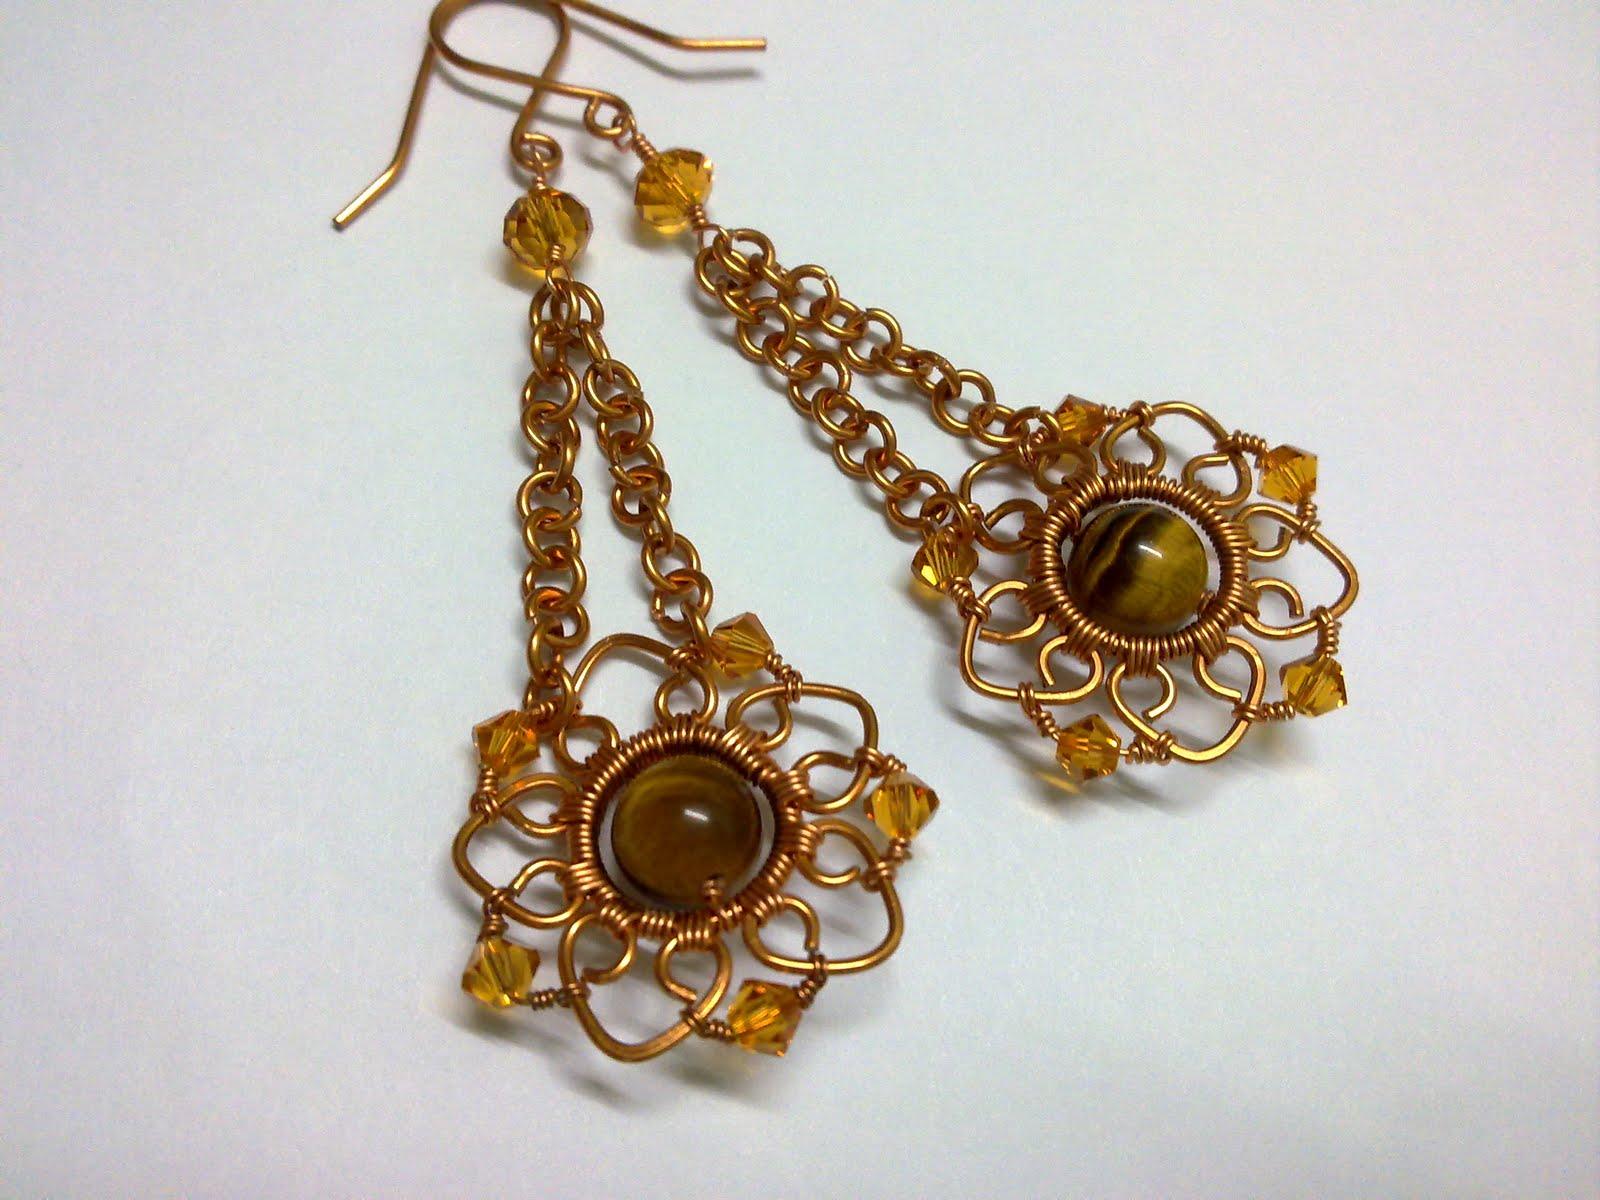 Handmade Wire Wred Jewelry Earrings Phalaenopsis Style 3 Customized Order